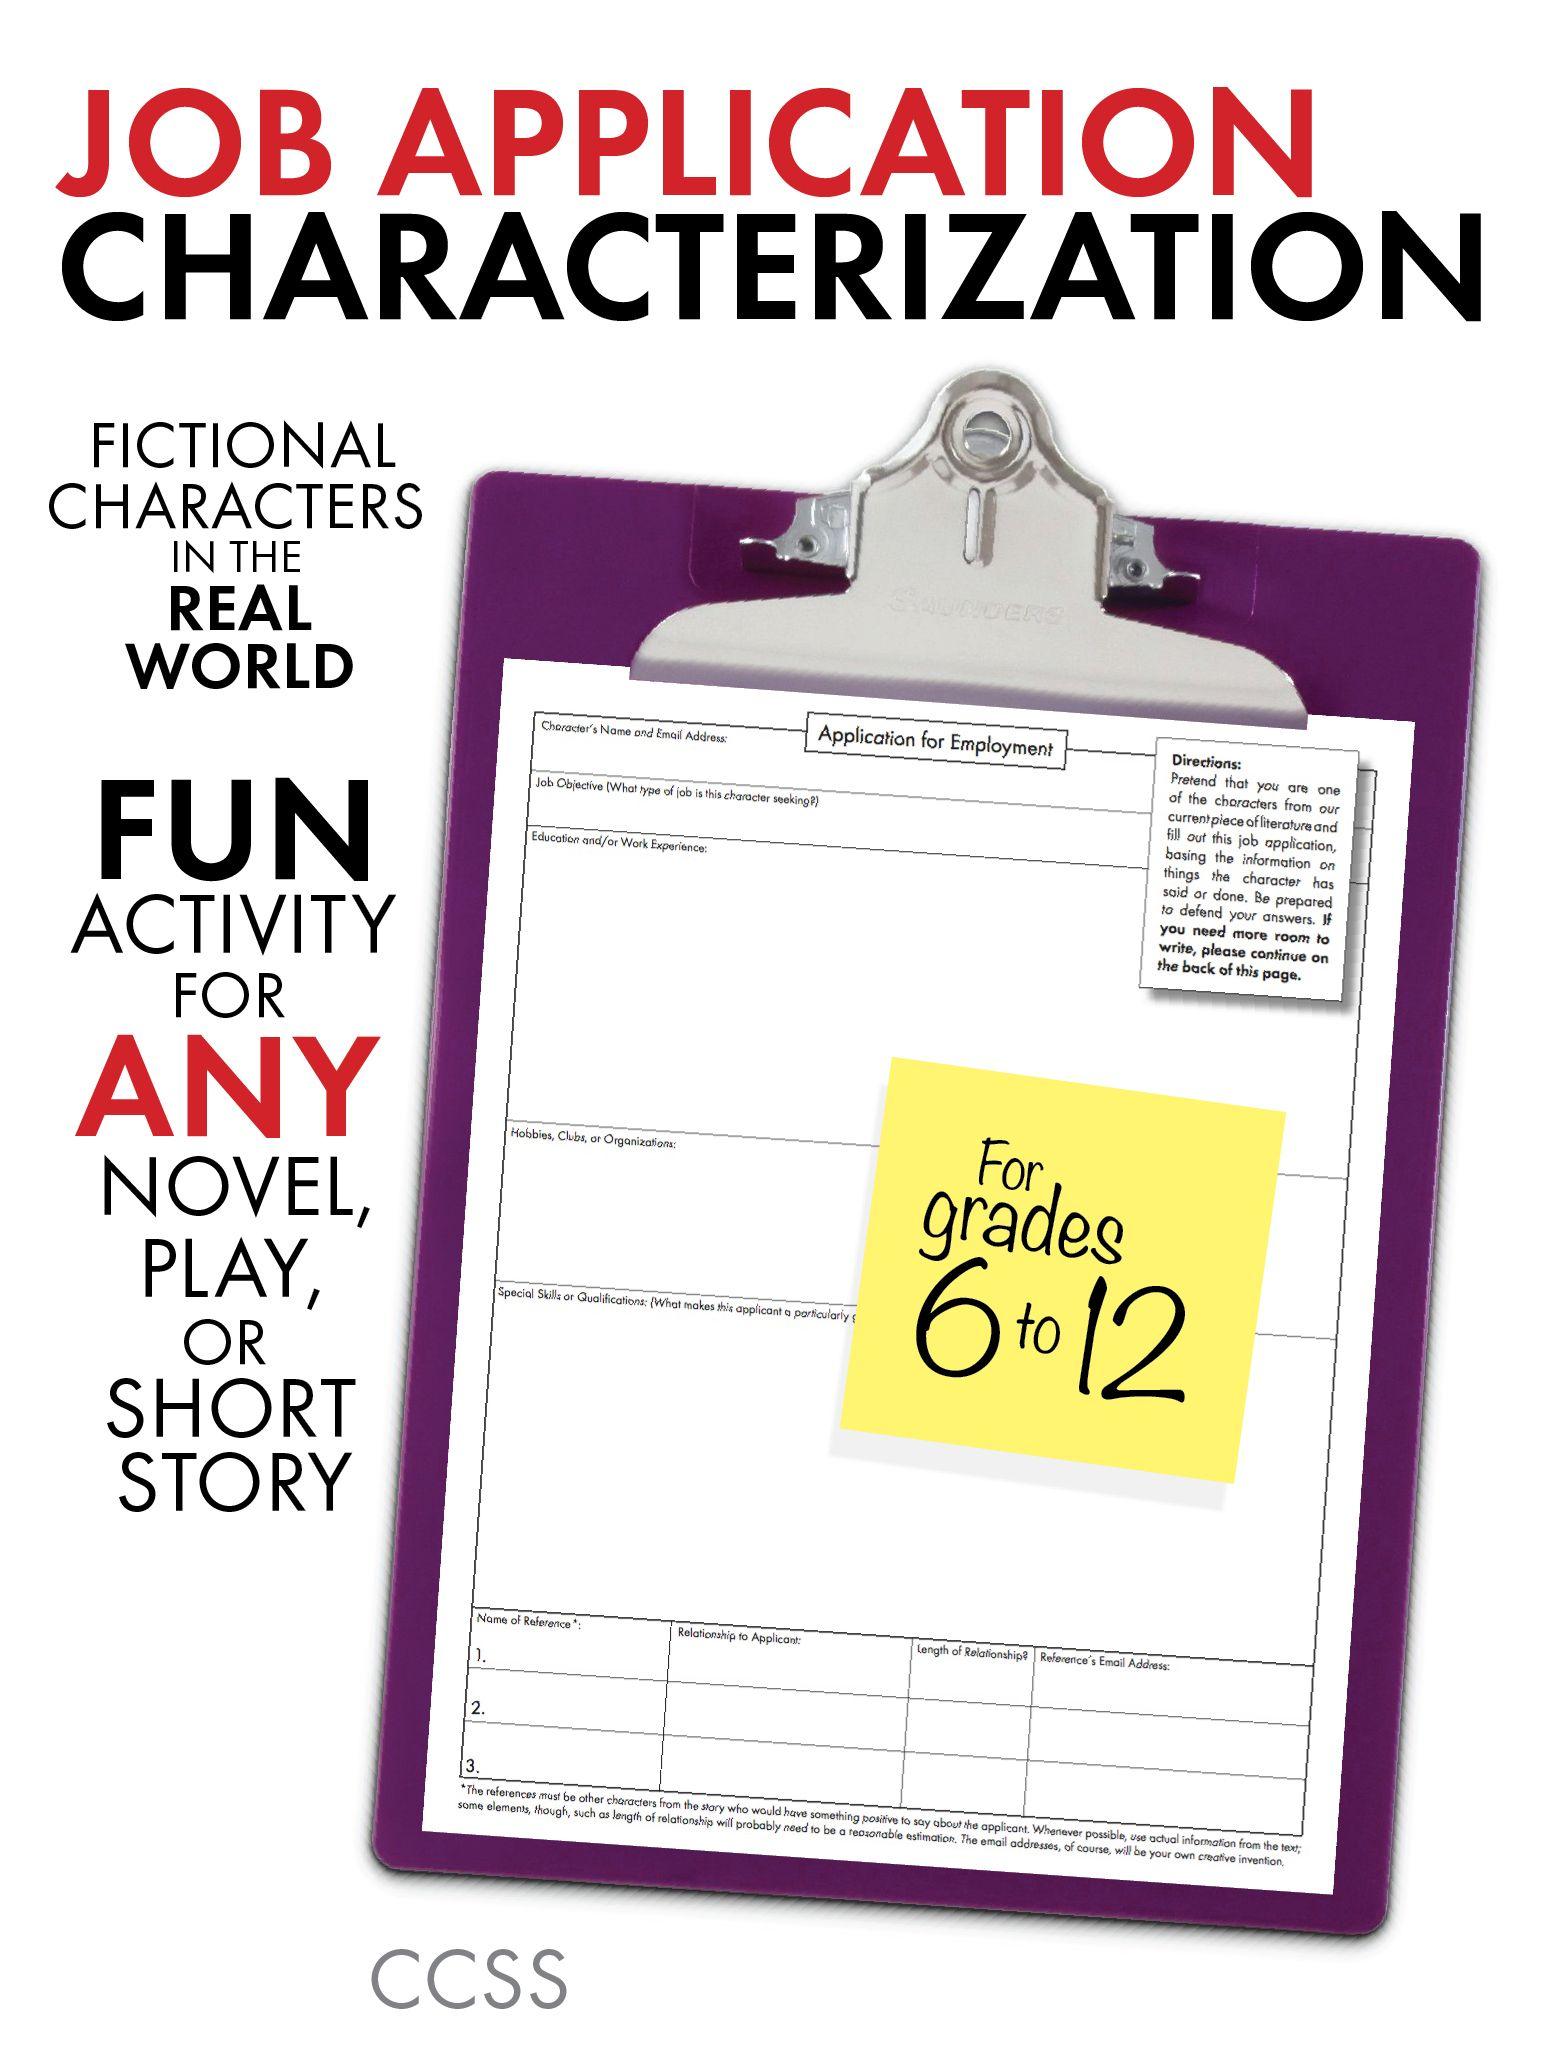 Job Application Characterization Fun Stuff Use With Any Lit Grades 6 12